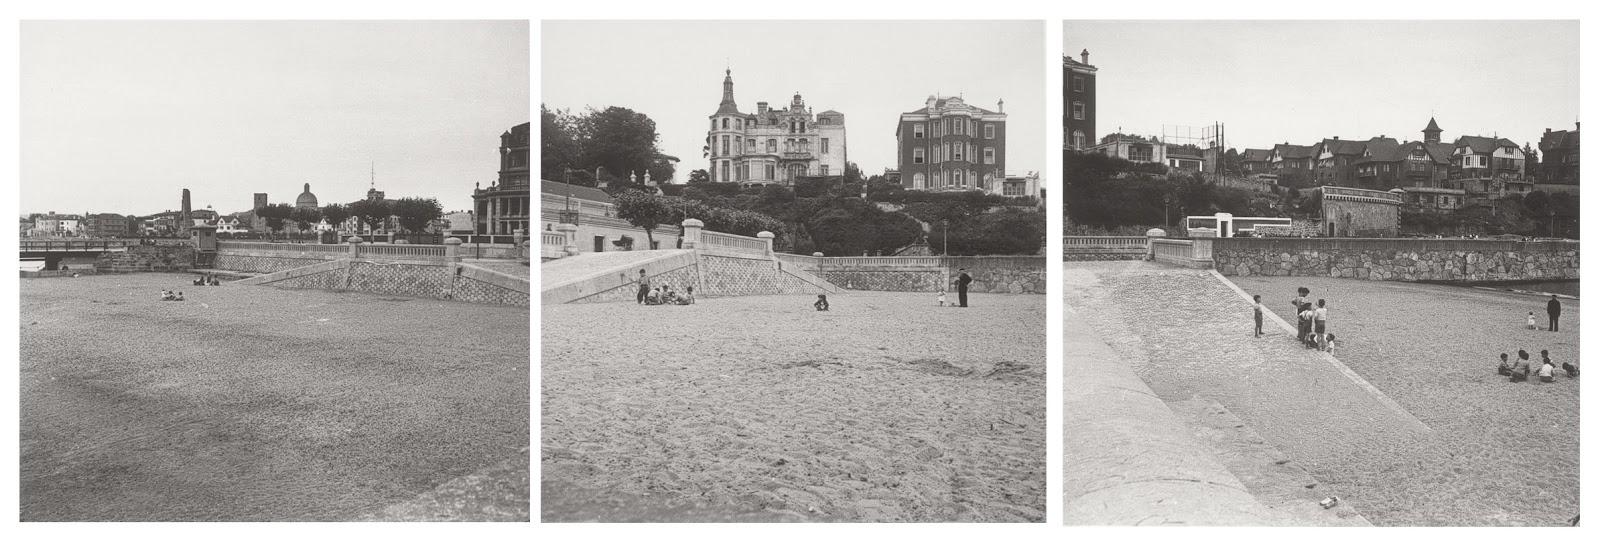 El mareometro blog la desaparicion de la playa de portugalete - Piscinas de portugalete ...